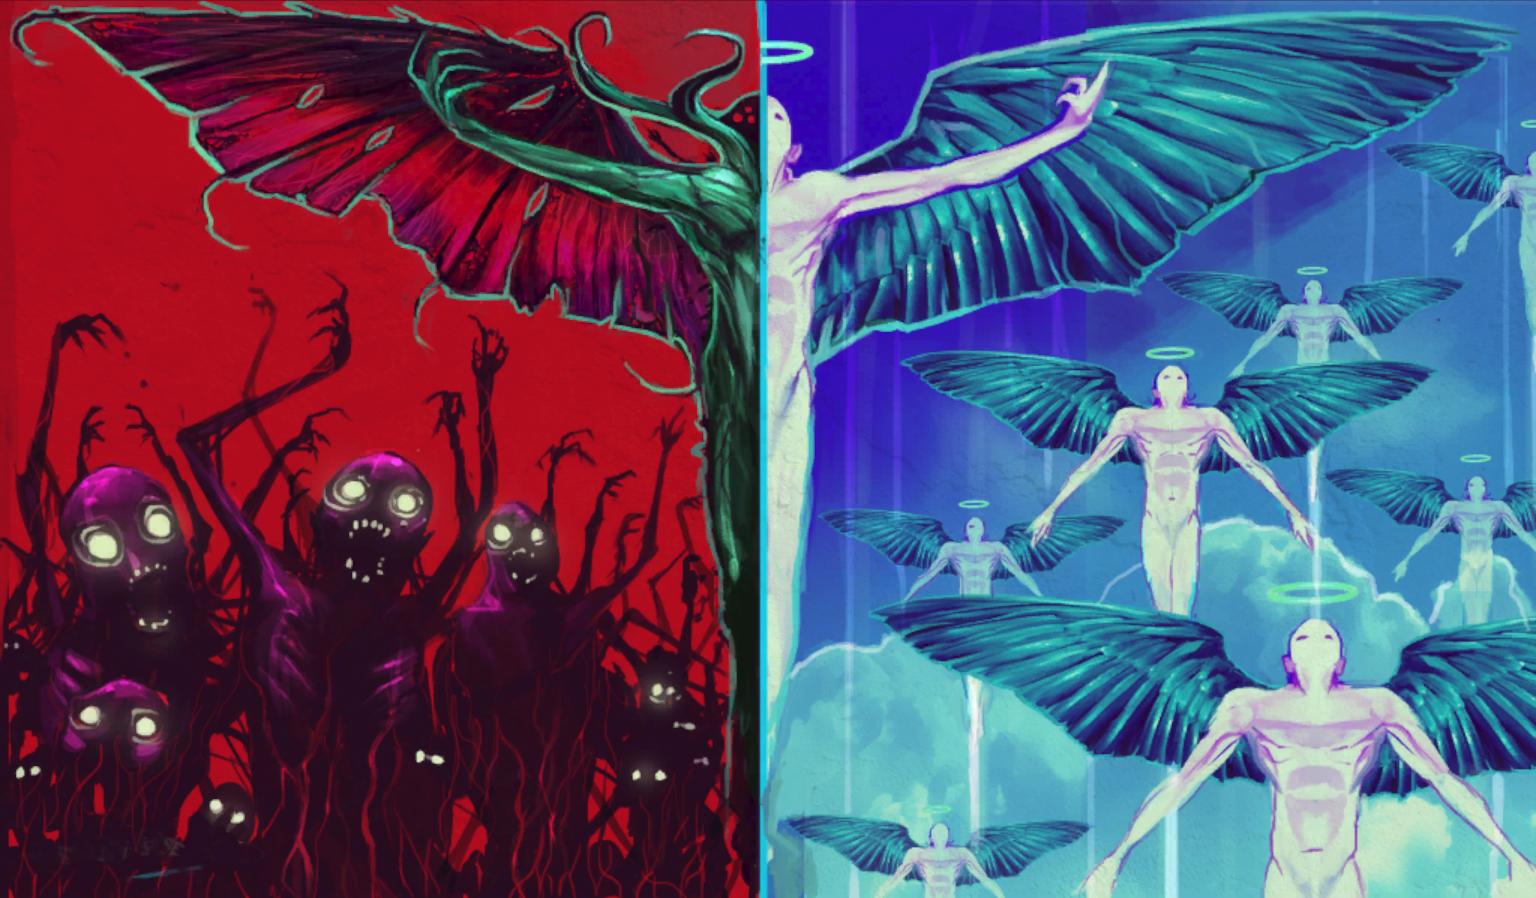 Occult, Satan and The o'jays on Pinterest